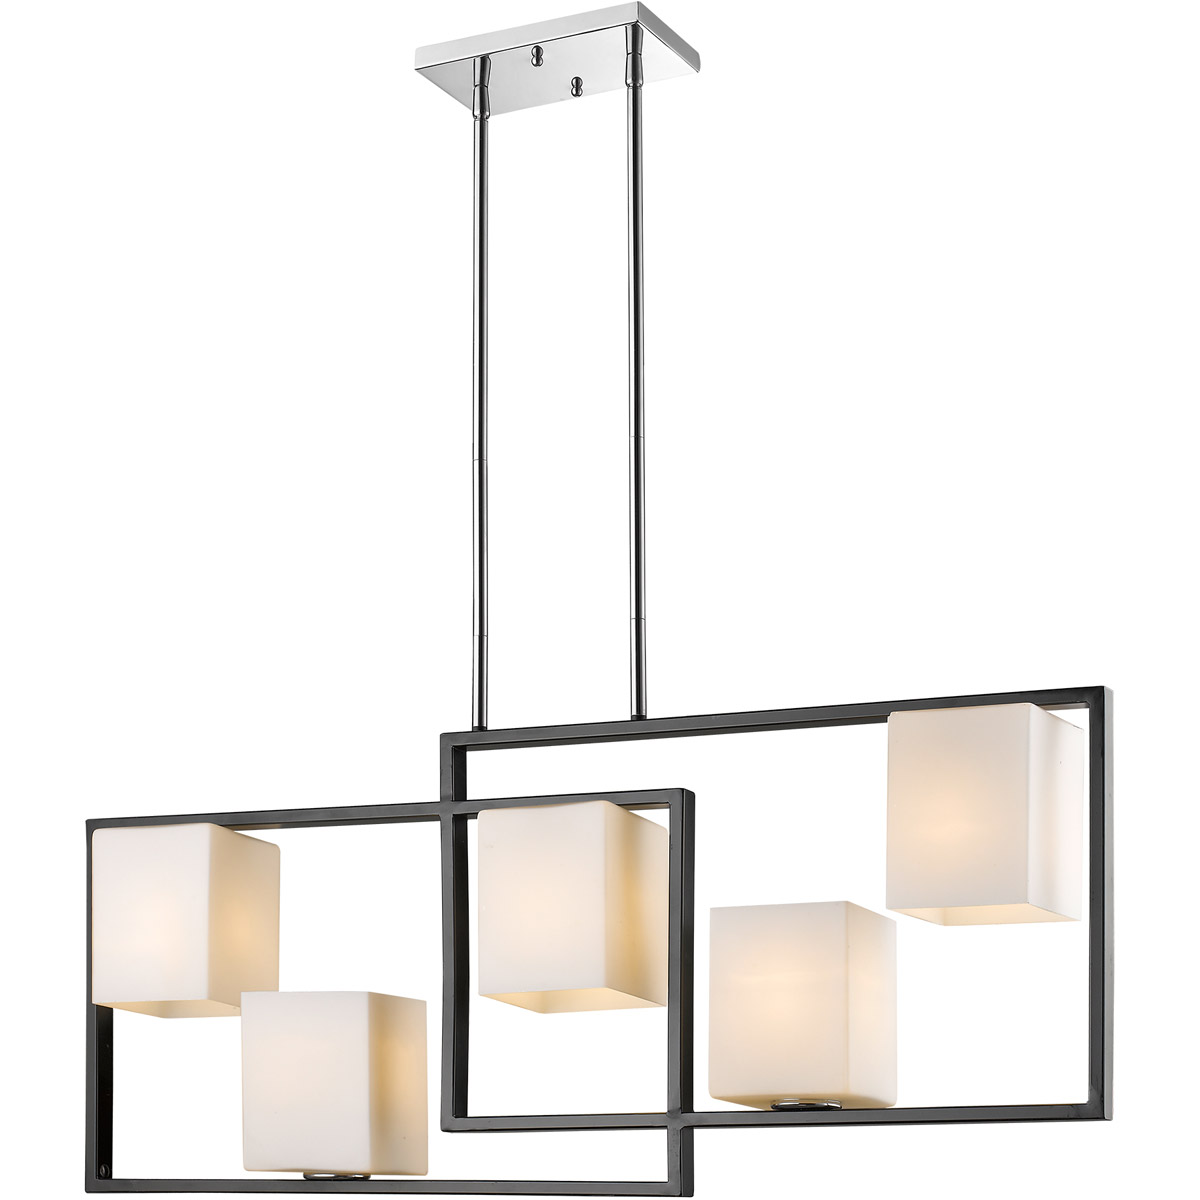 led lamp eglo chrome cartama lighting pendant square bar shades light with polished pin